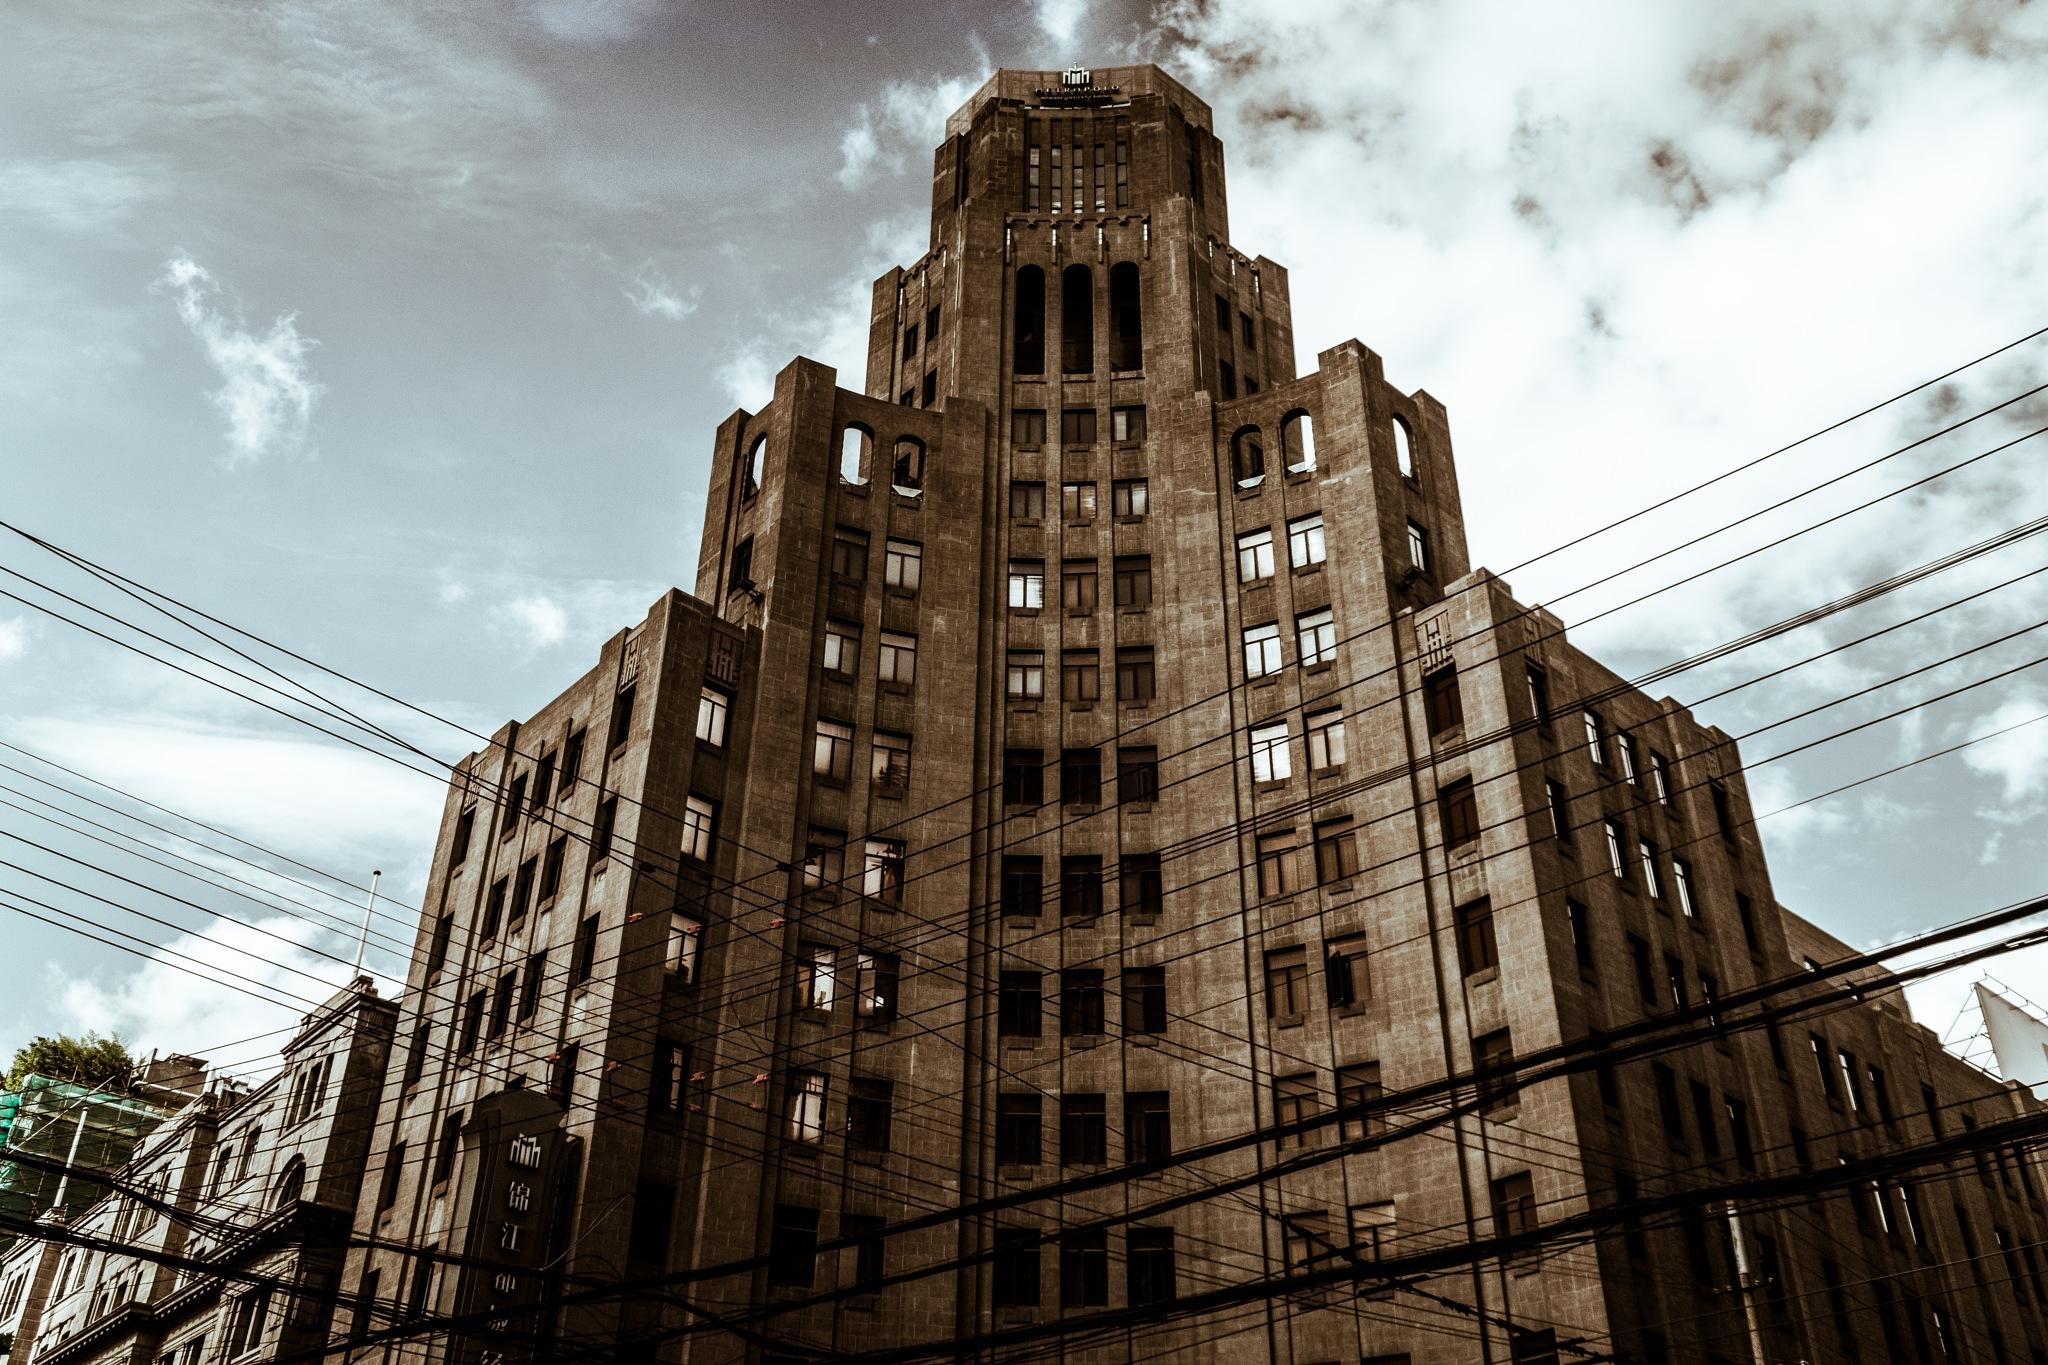 Hotel Building by Oleg Shibanov